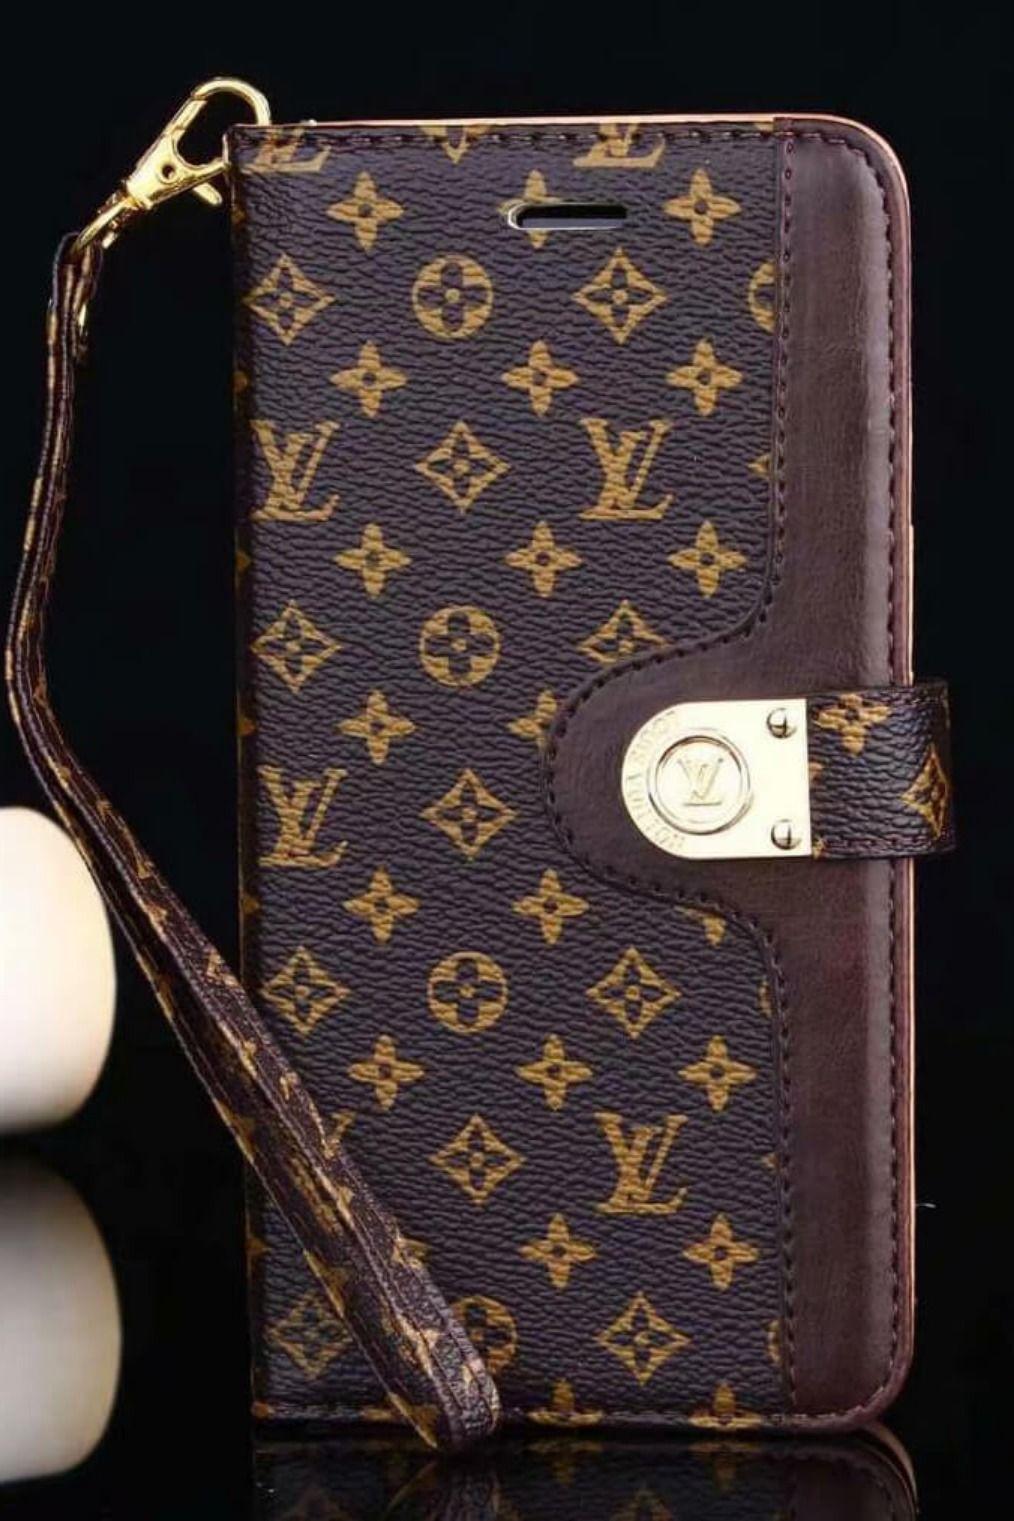 Lv iphone case brown 11 pro xs max xr 8 plus luxury wallet